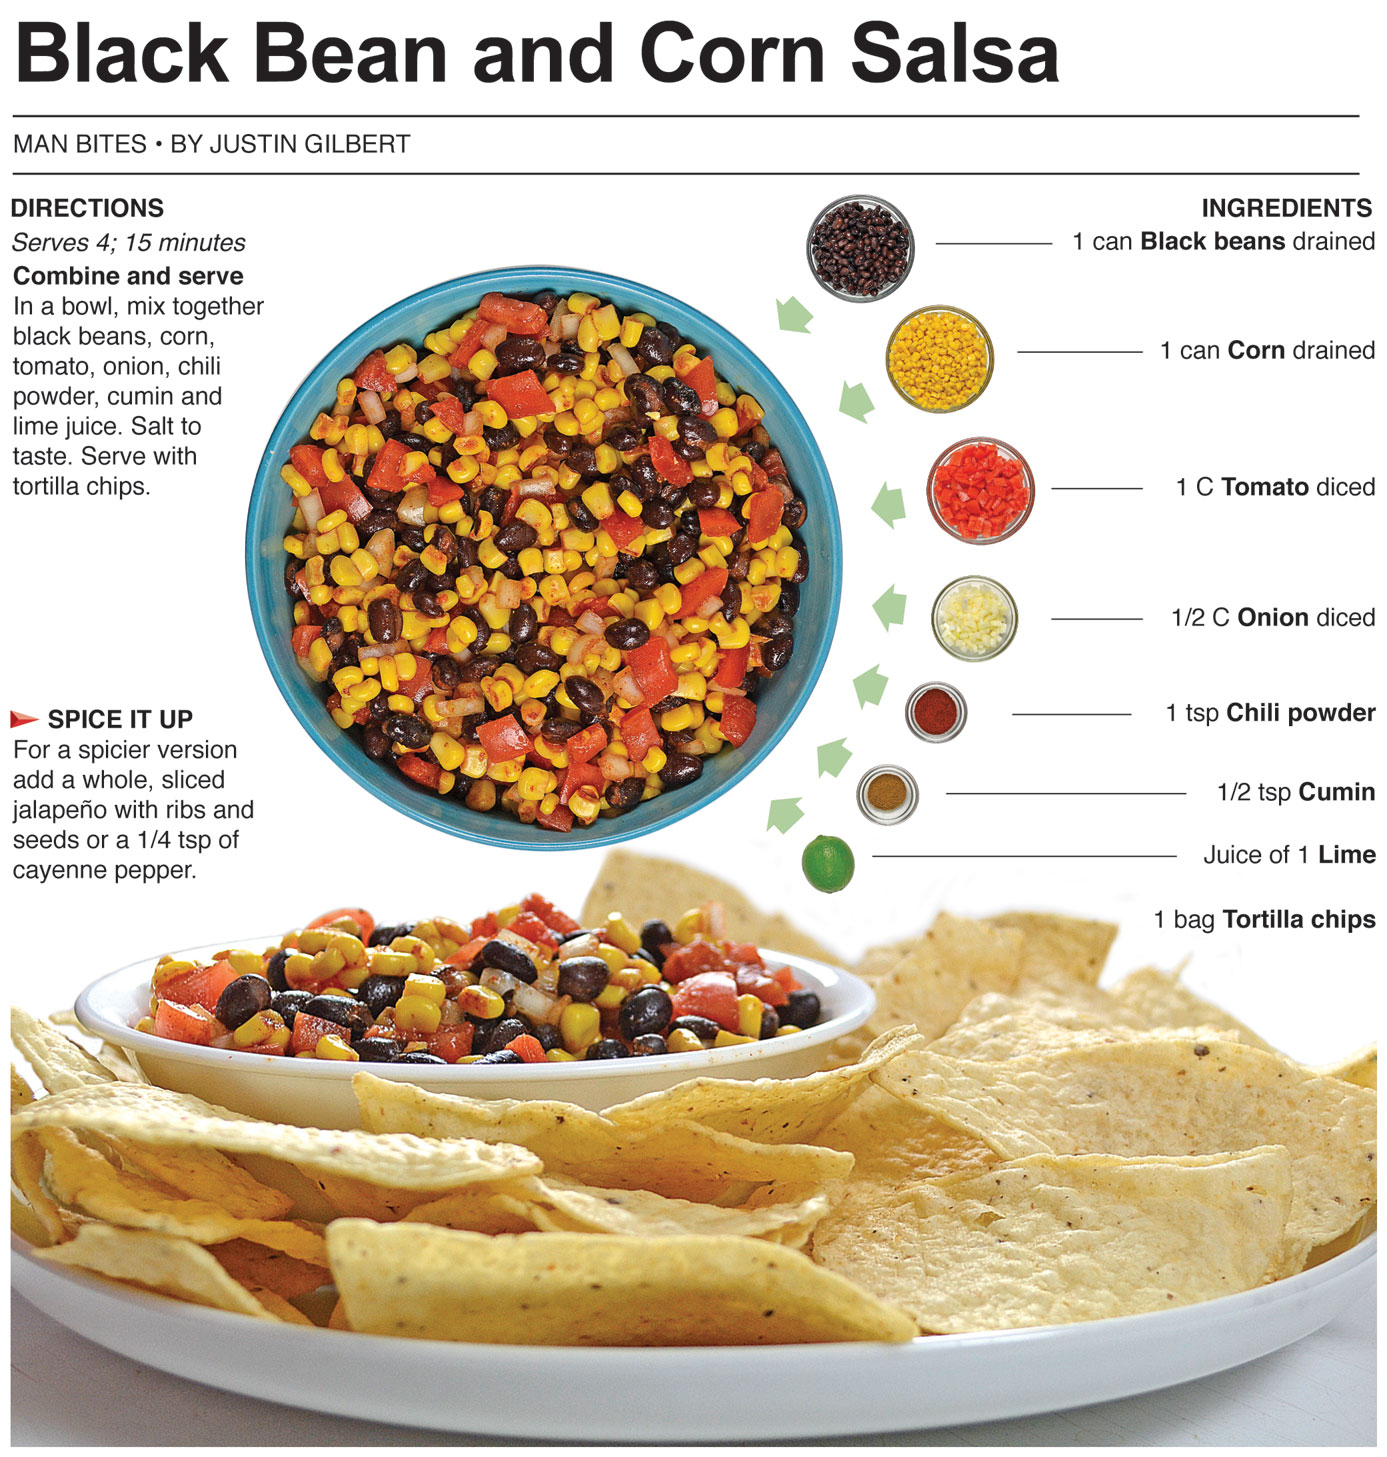 Behind the Bites: Black Bean and Corn Salsa